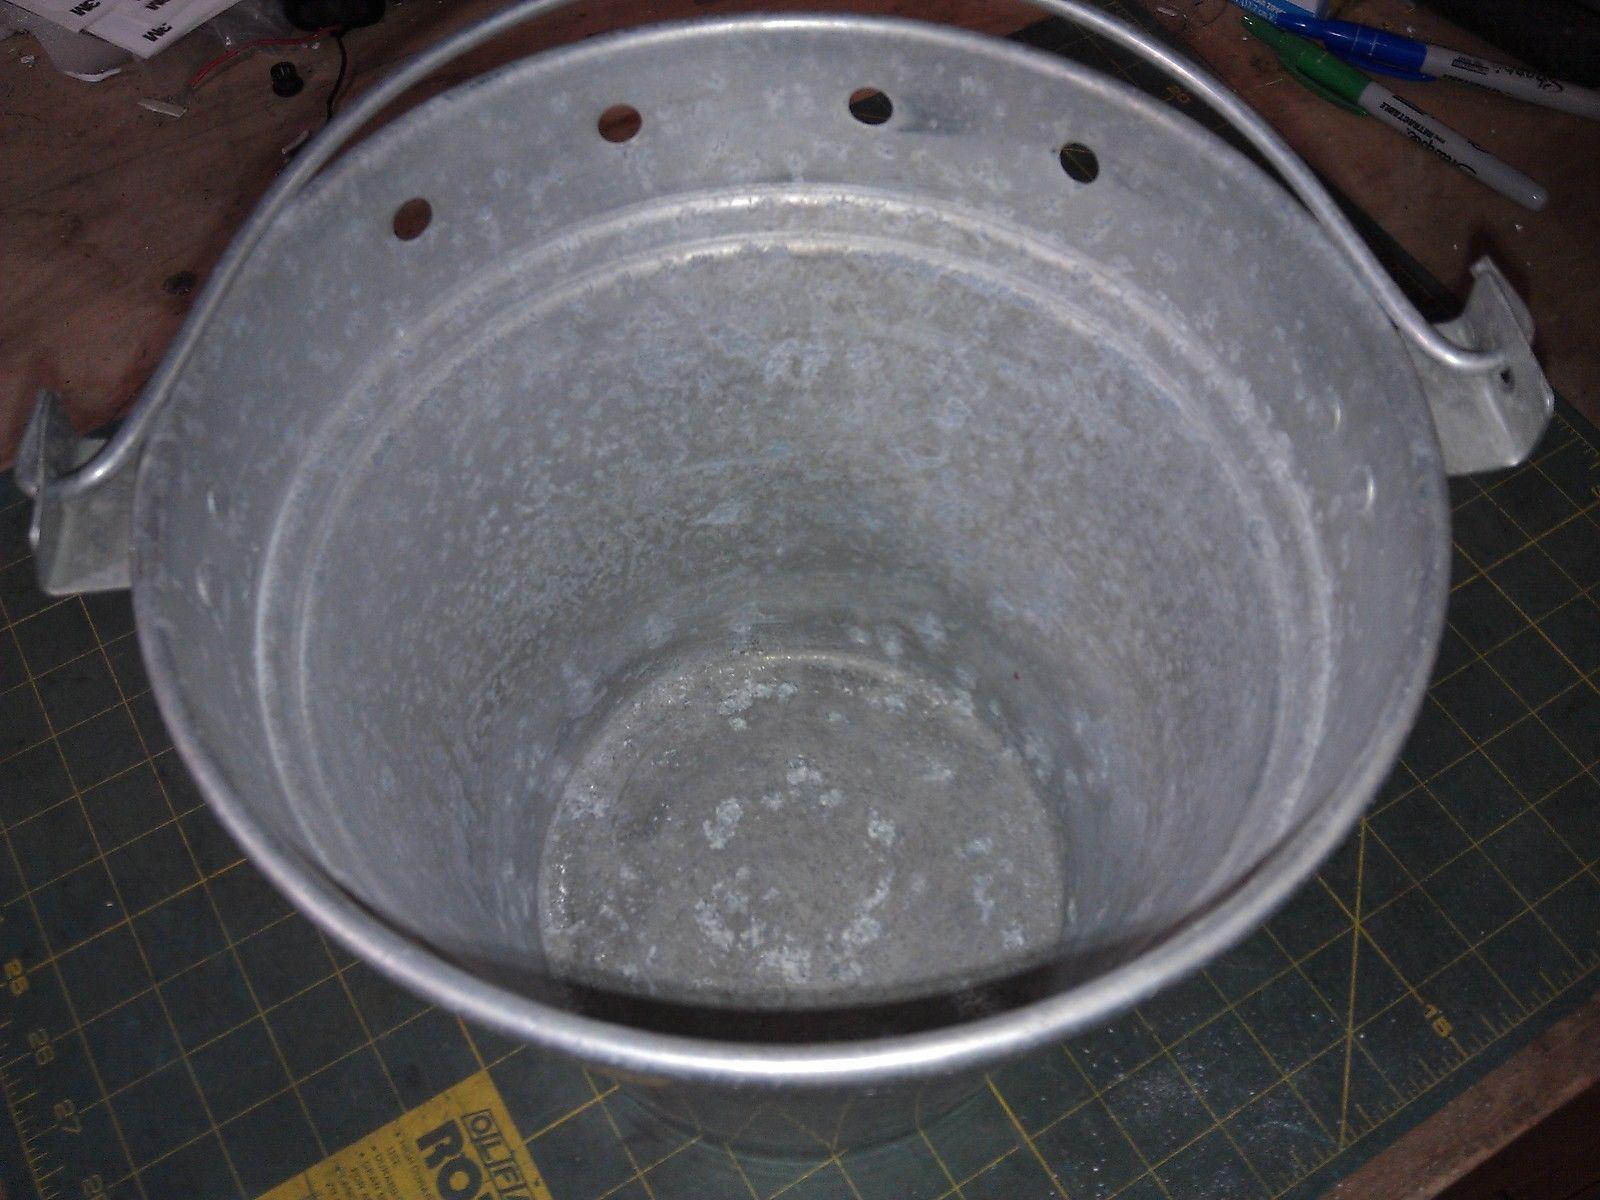 6JJ45 ALUMINUM PAIL, FROM ICE CREAM FREEZER, GOOD CONDITION image 5